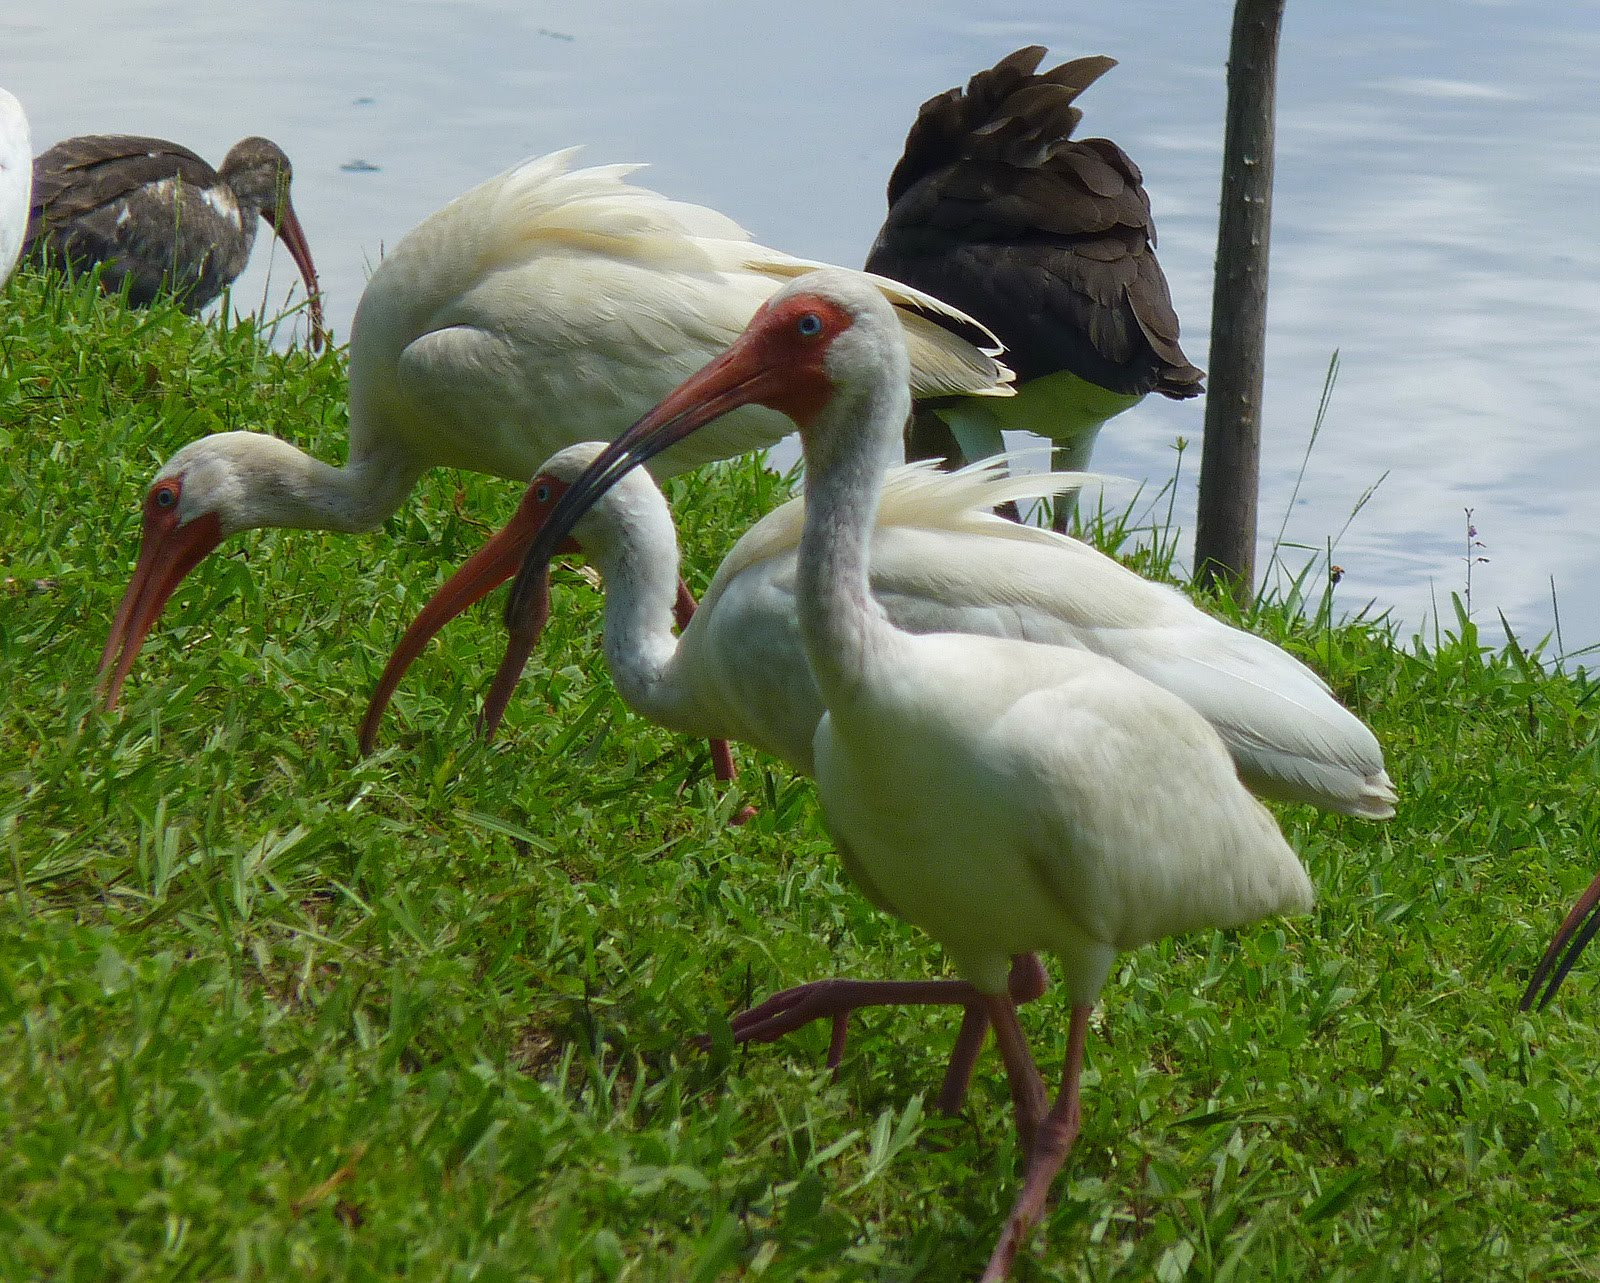 Best ideas about Florida Backyard Birds . Save or Pin My Florida Backyard July 2010 Now.